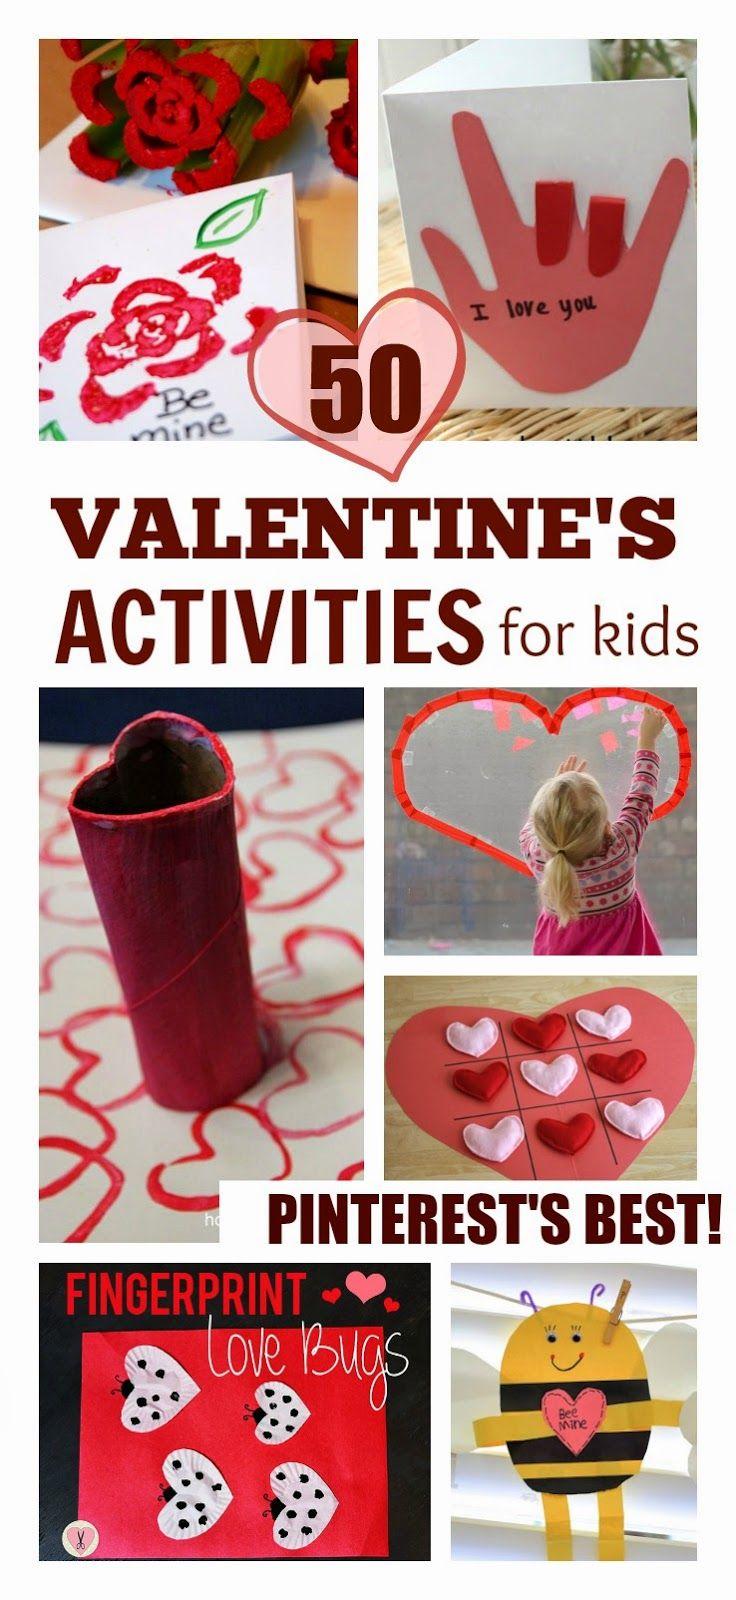 17 best images about valentine 39 s day sunday school children 39 s ministry ideas on pinterest. Black Bedroom Furniture Sets. Home Design Ideas